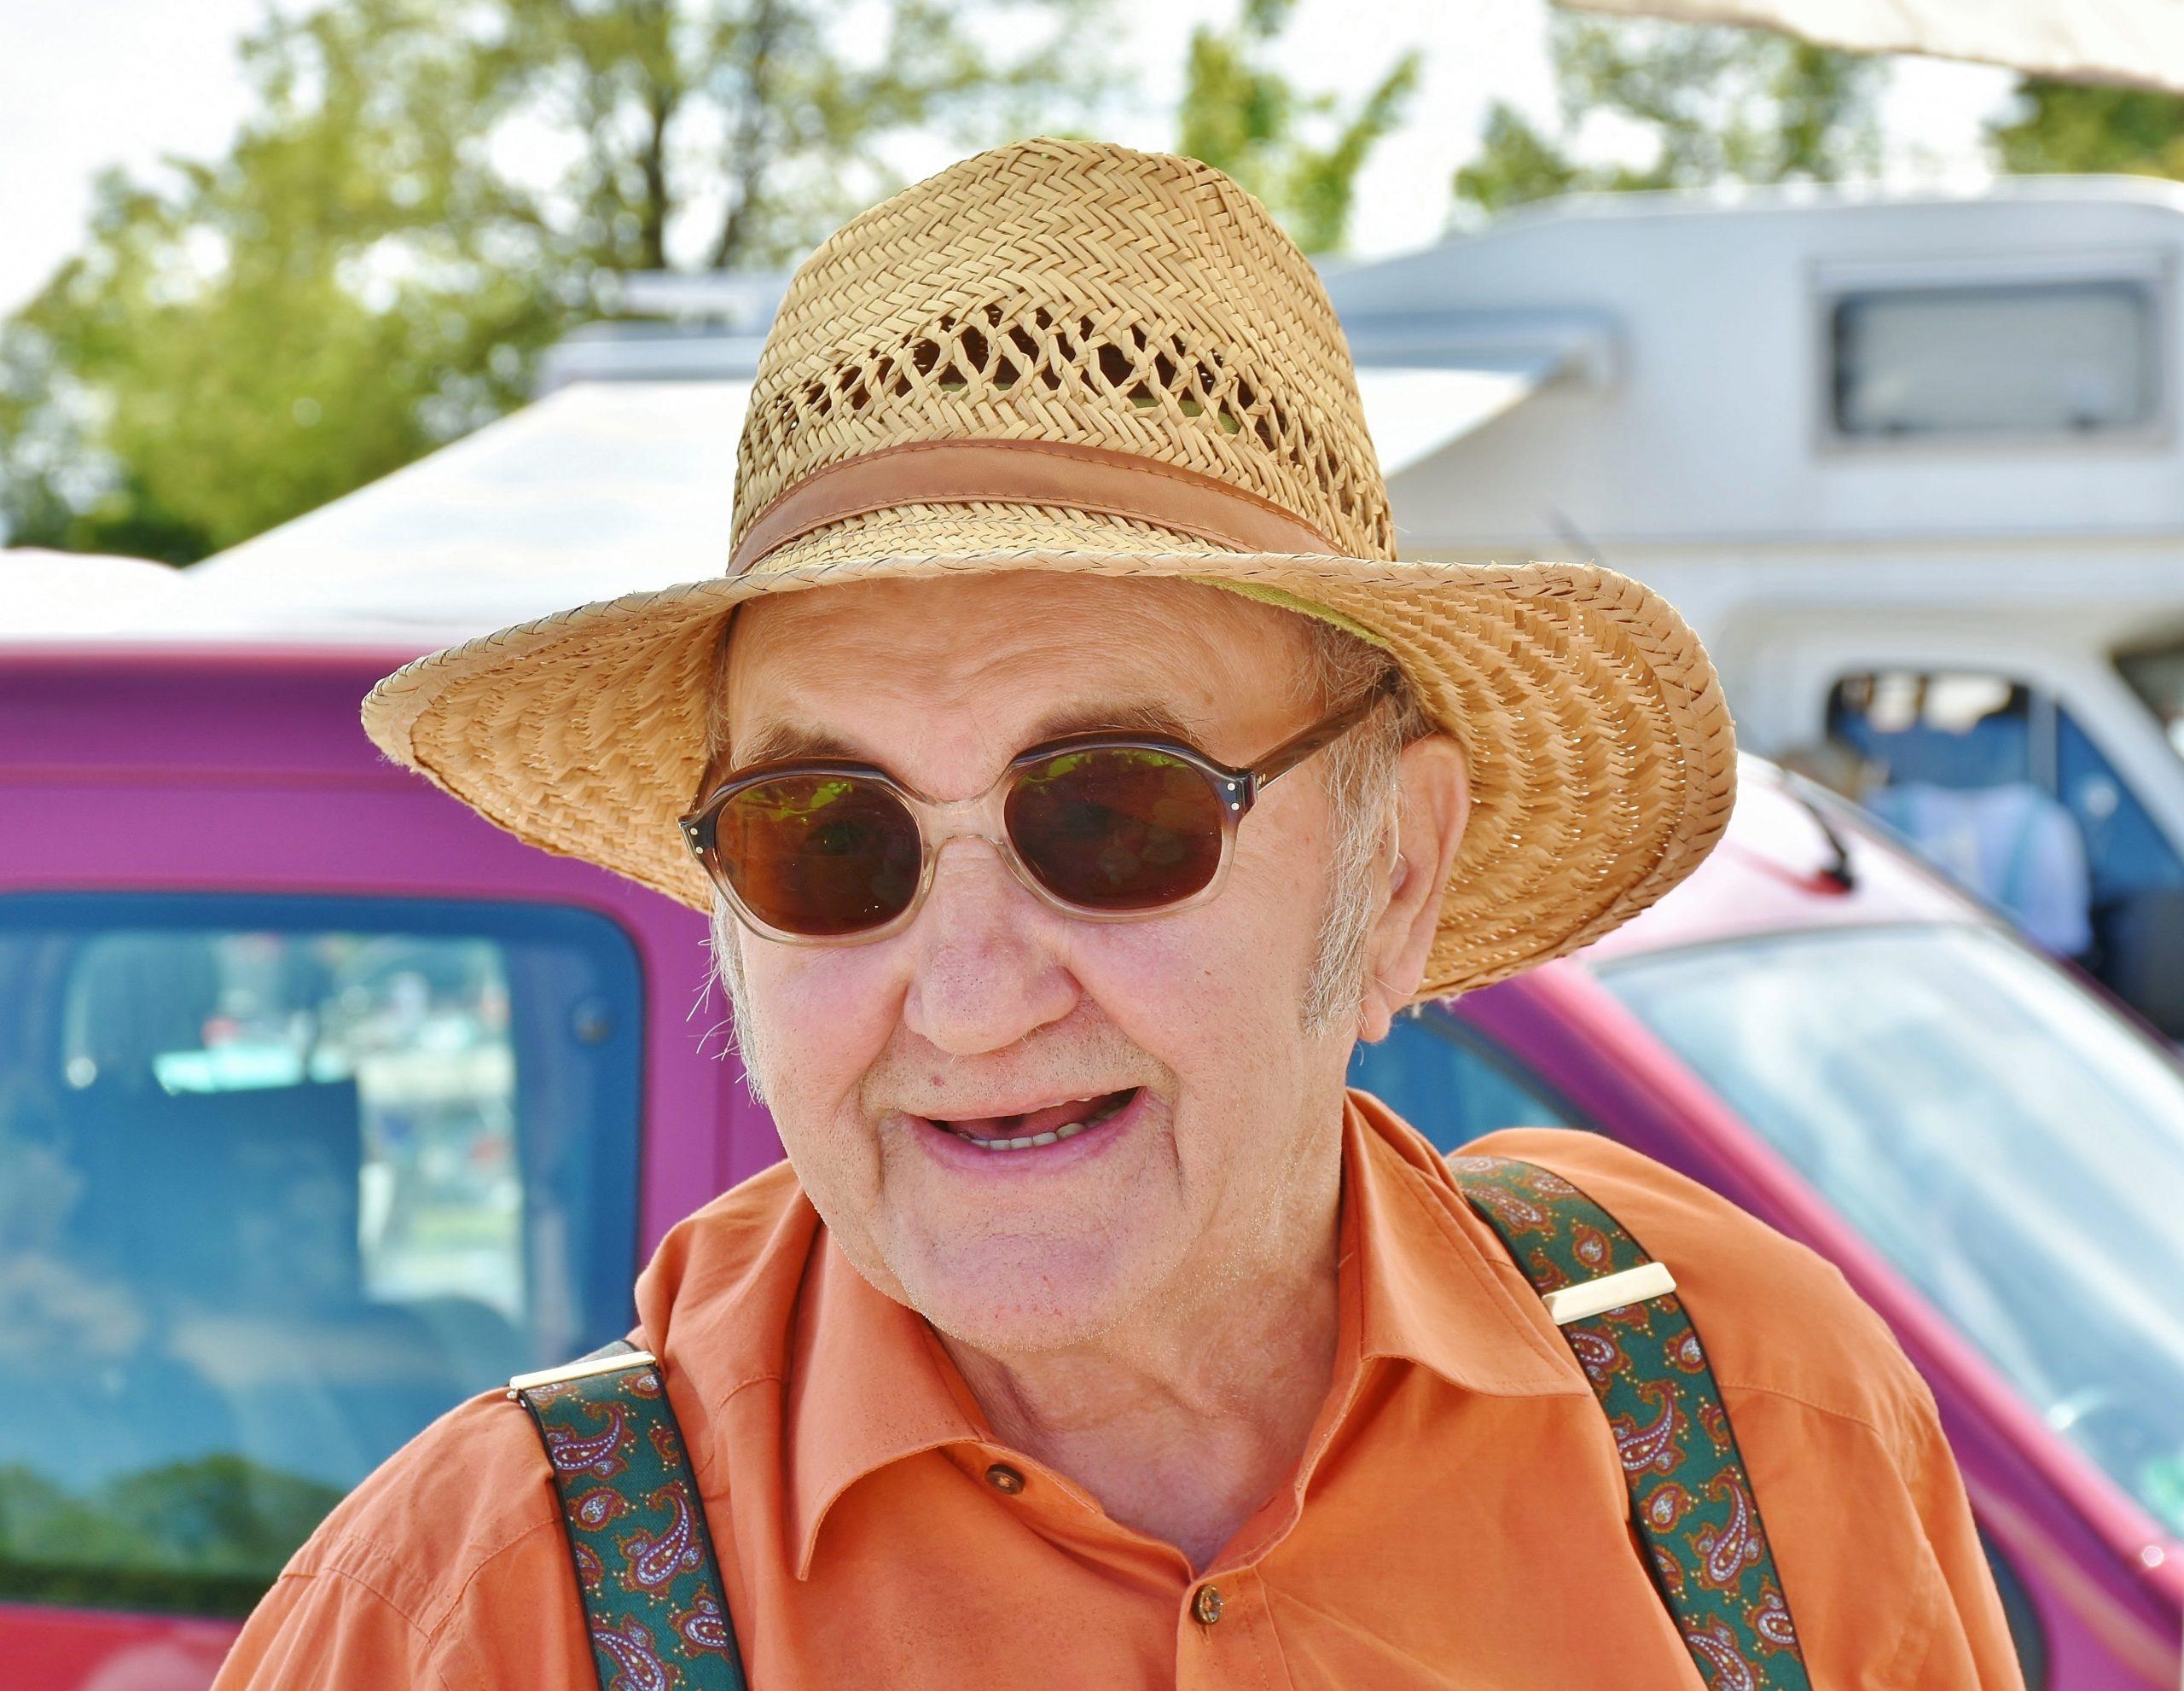 Eye-Health-Senior-Man-Wearing-Sunglassess-Outside